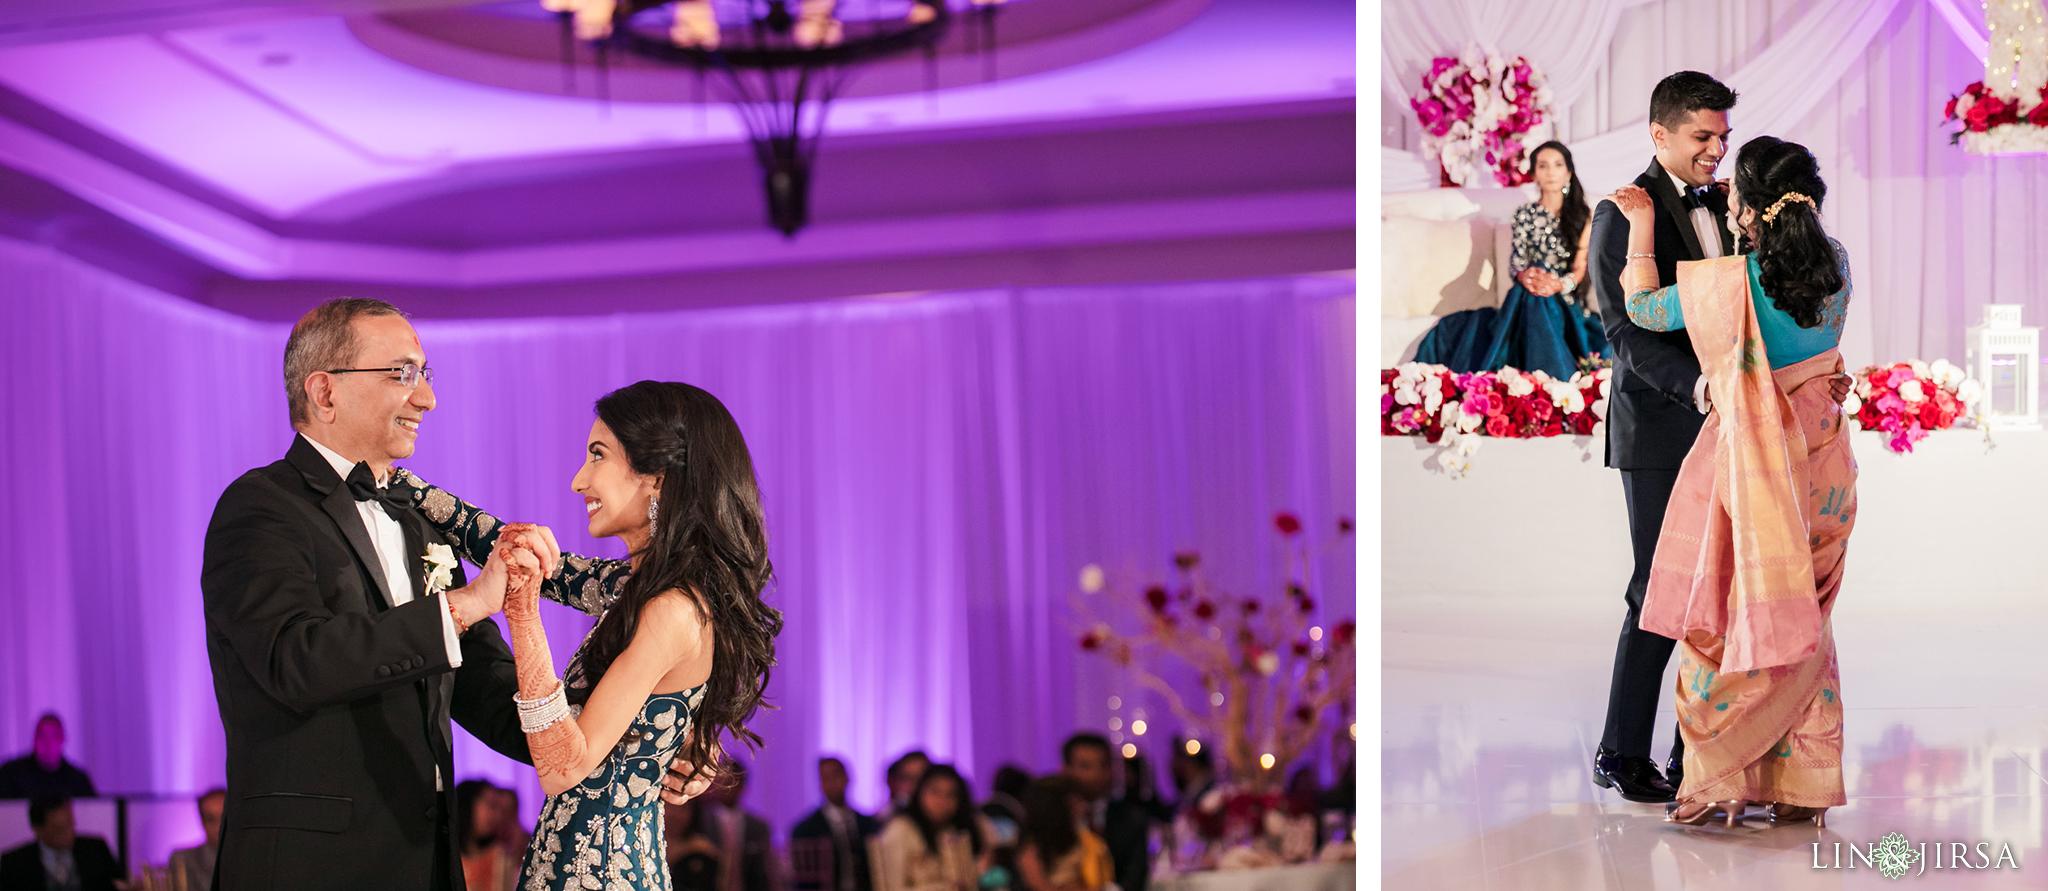 45 Loews Coronado Bay Resort San Diego Indian Wedding Photography